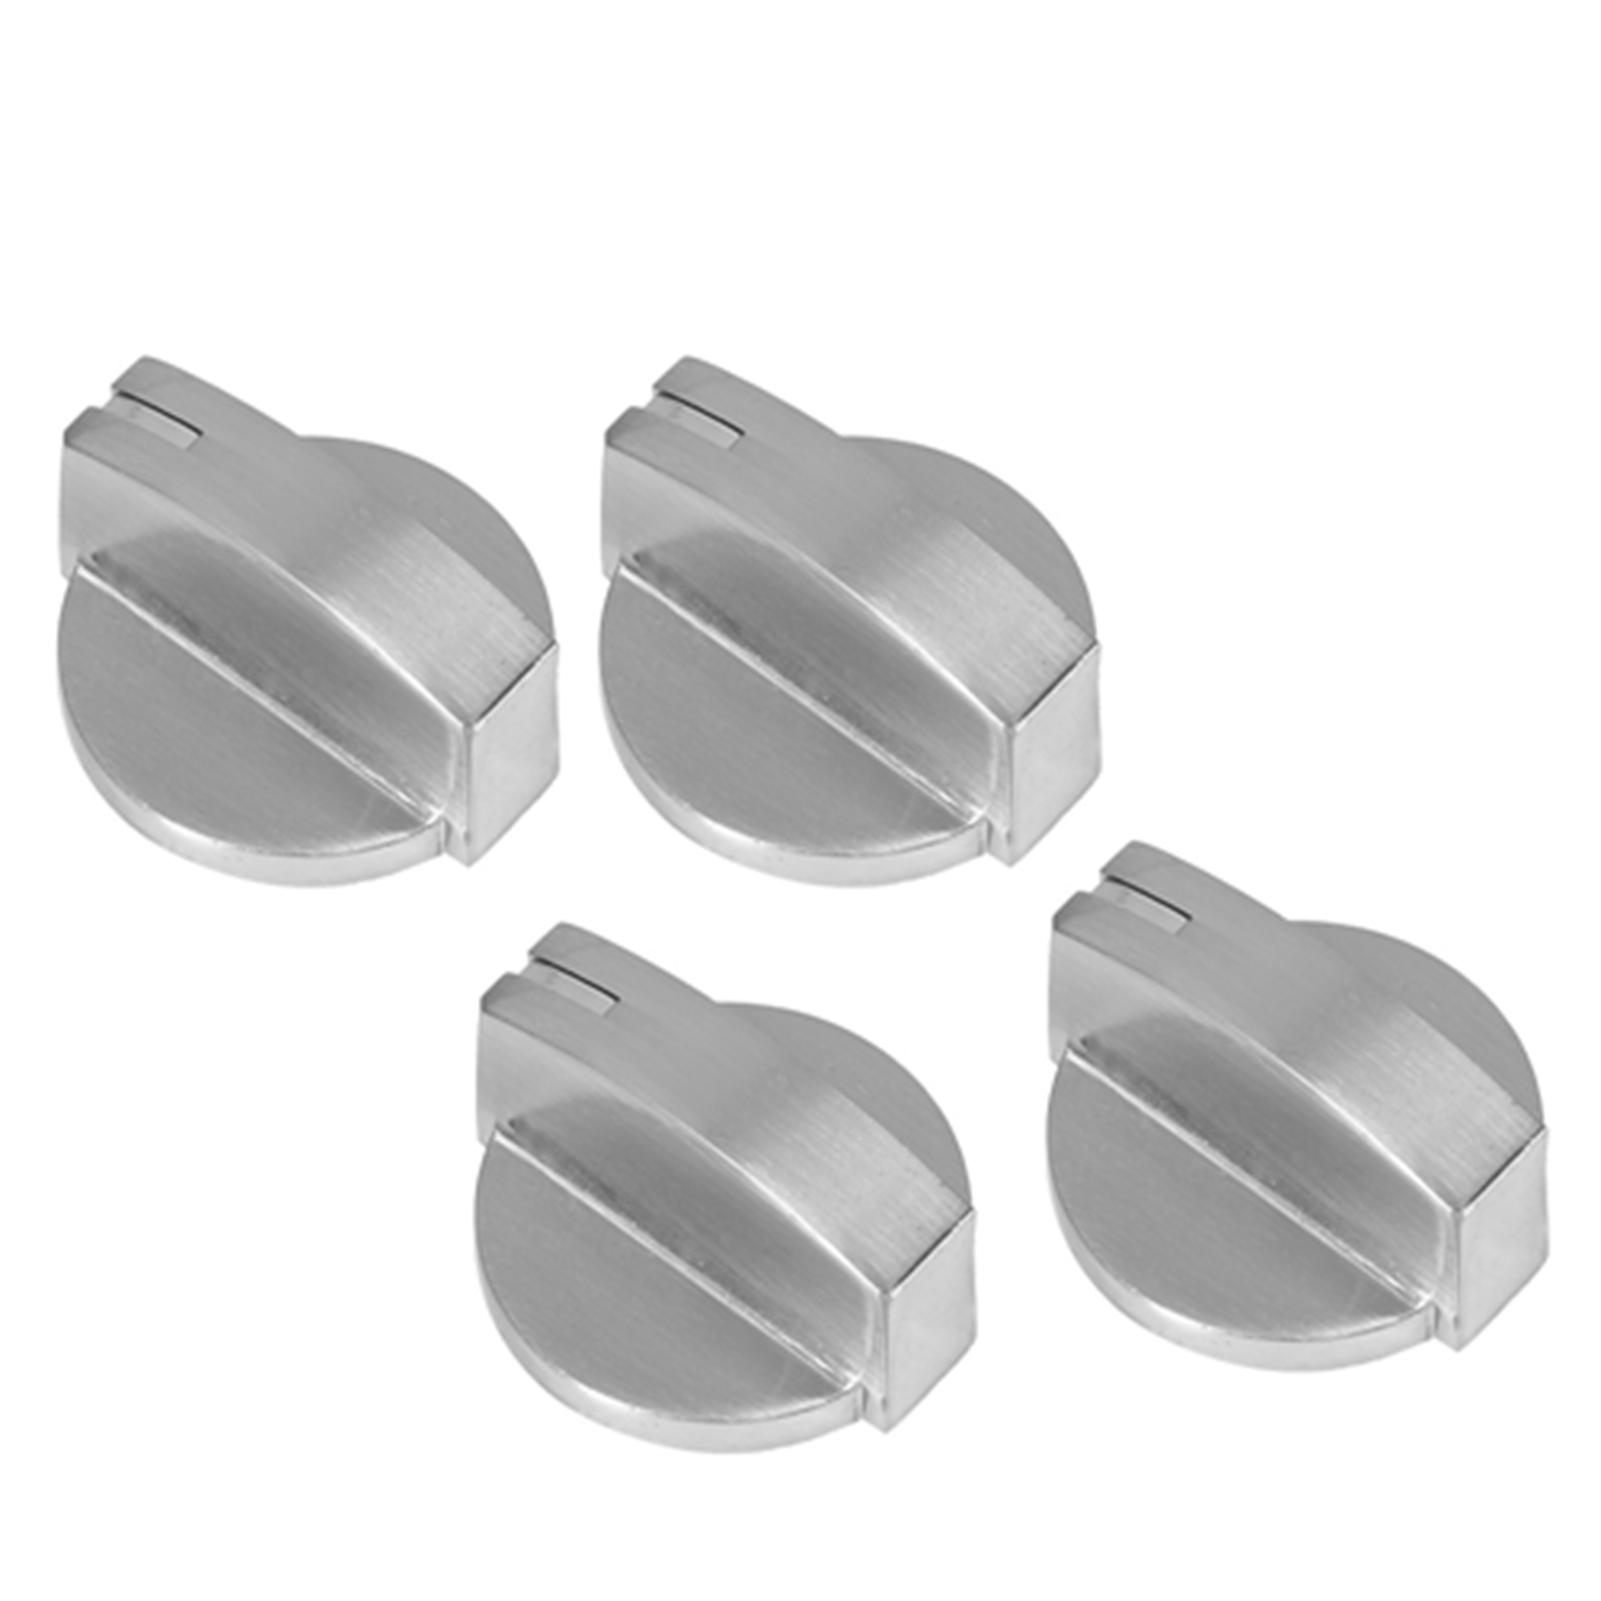 Details about  /4Pcs Universal Zinc Alloy Gas Stove Control Knob Rotating Switch Part New